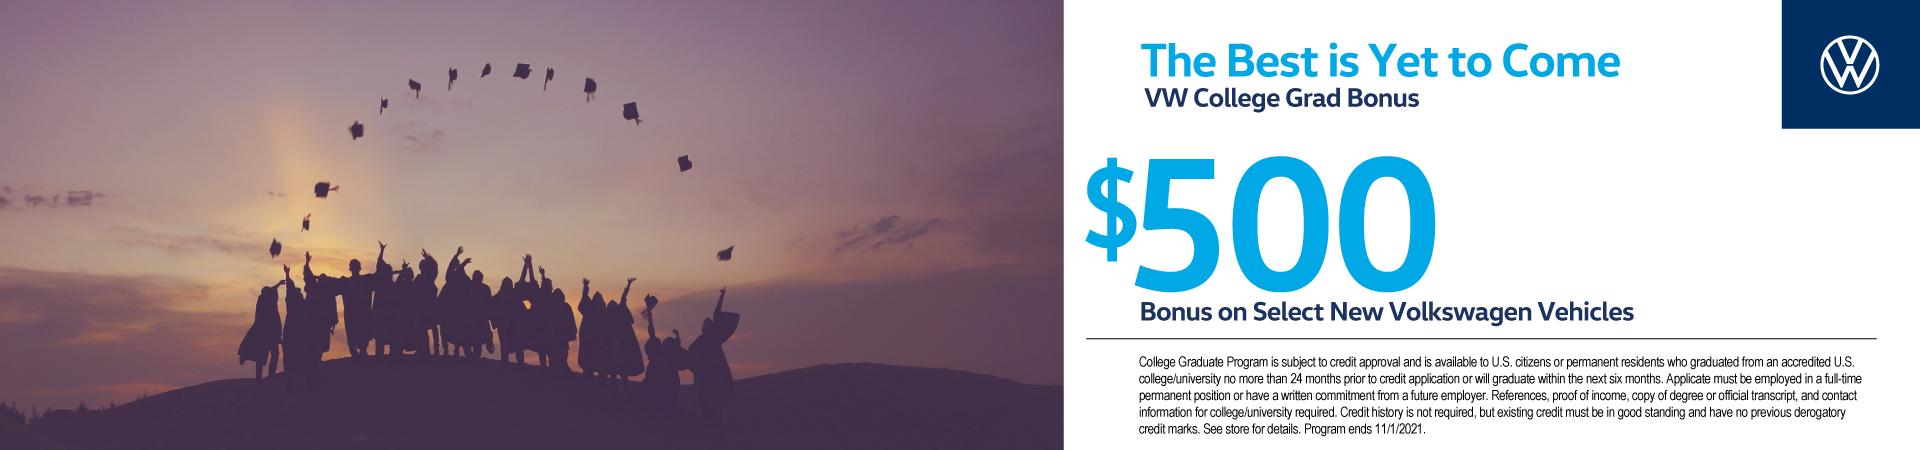 Oct-2021-VW-CS-Slides_1000-College-Grad-Rebate